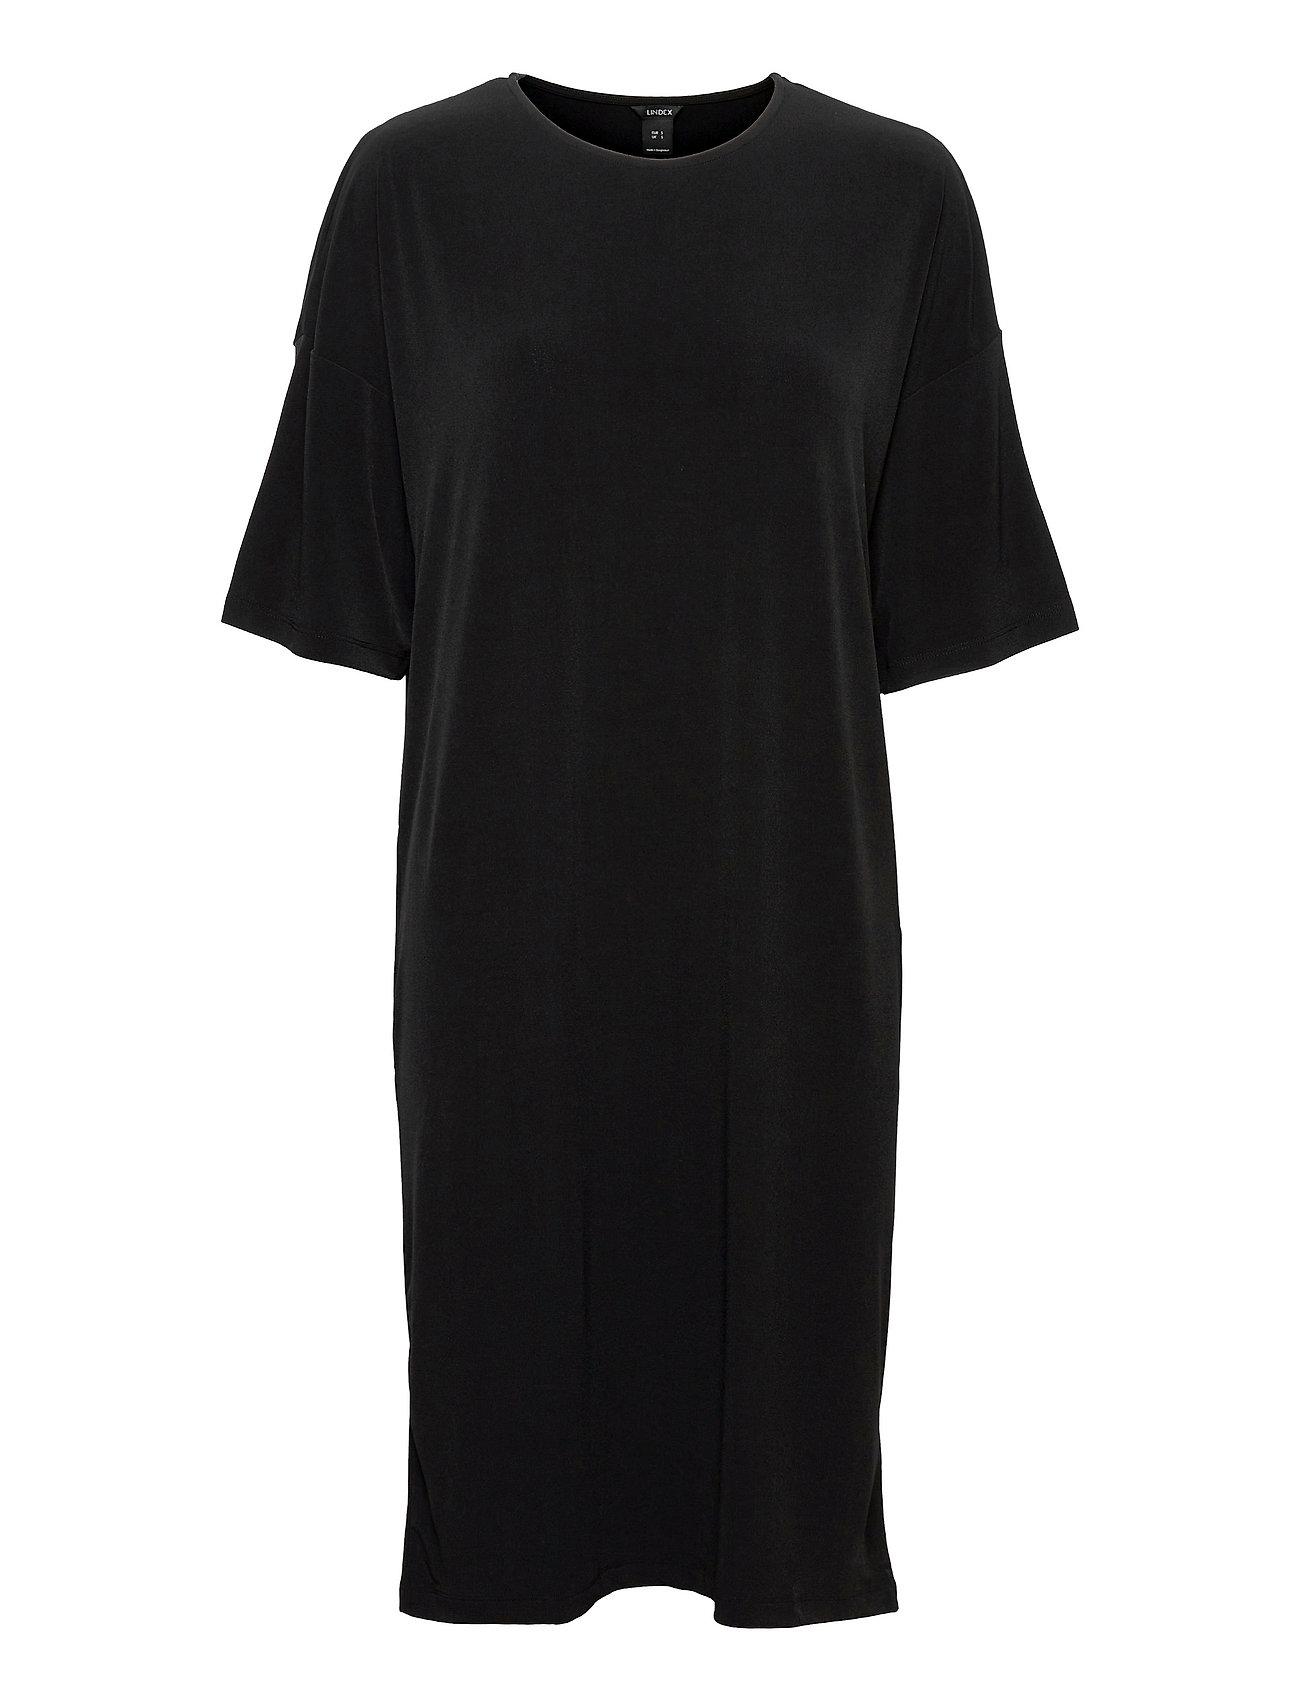 Dress Jenna Dresses T-shirt Dresses Sort Lindex